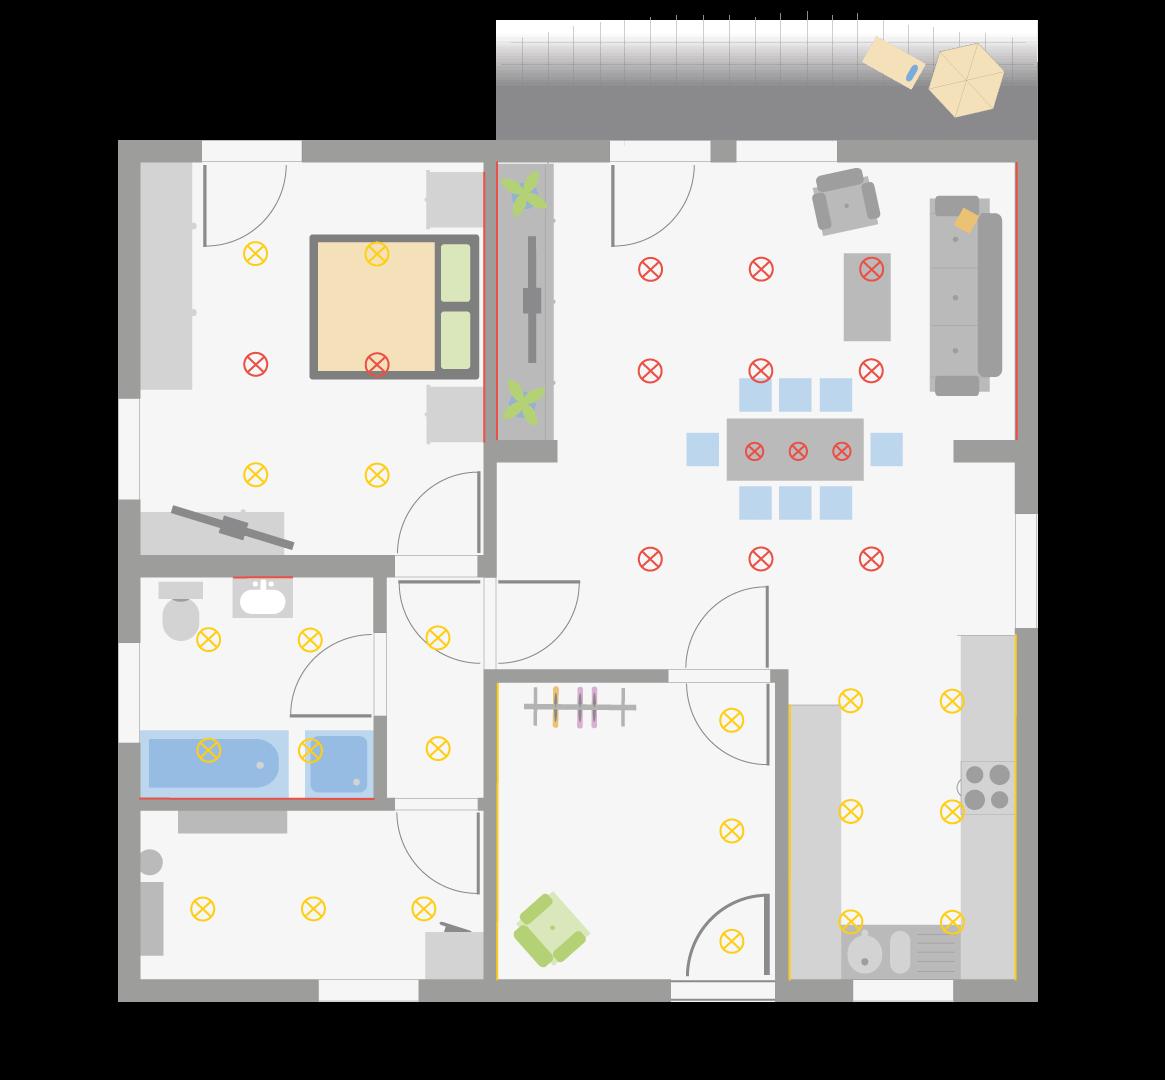 video blog einsatz von led spots loxone blog. Black Bedroom Furniture Sets. Home Design Ideas